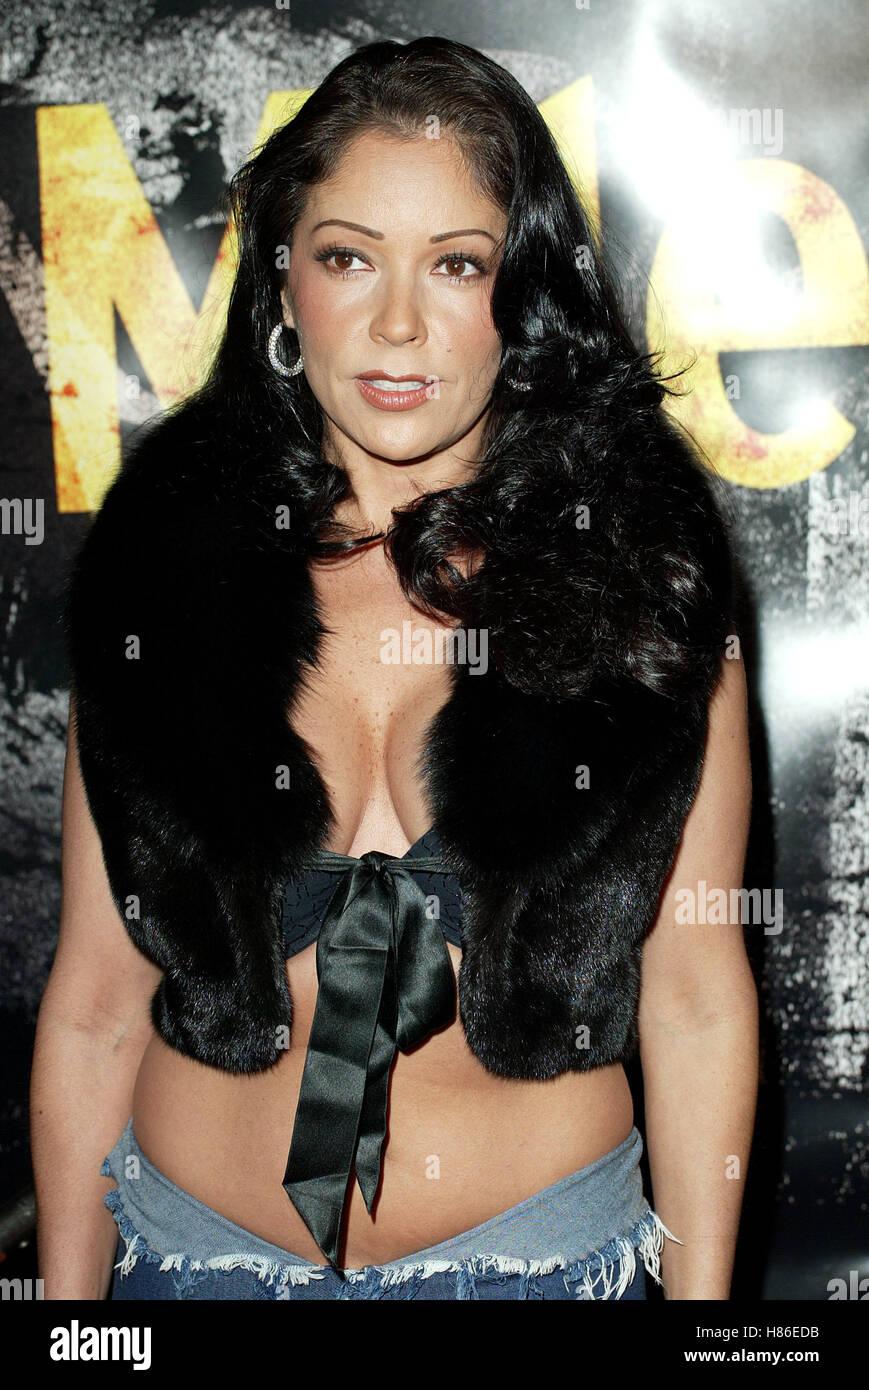 Apollonia Kotero nudes (55 photos), Topless, Cleavage, Feet, cleavage 2020